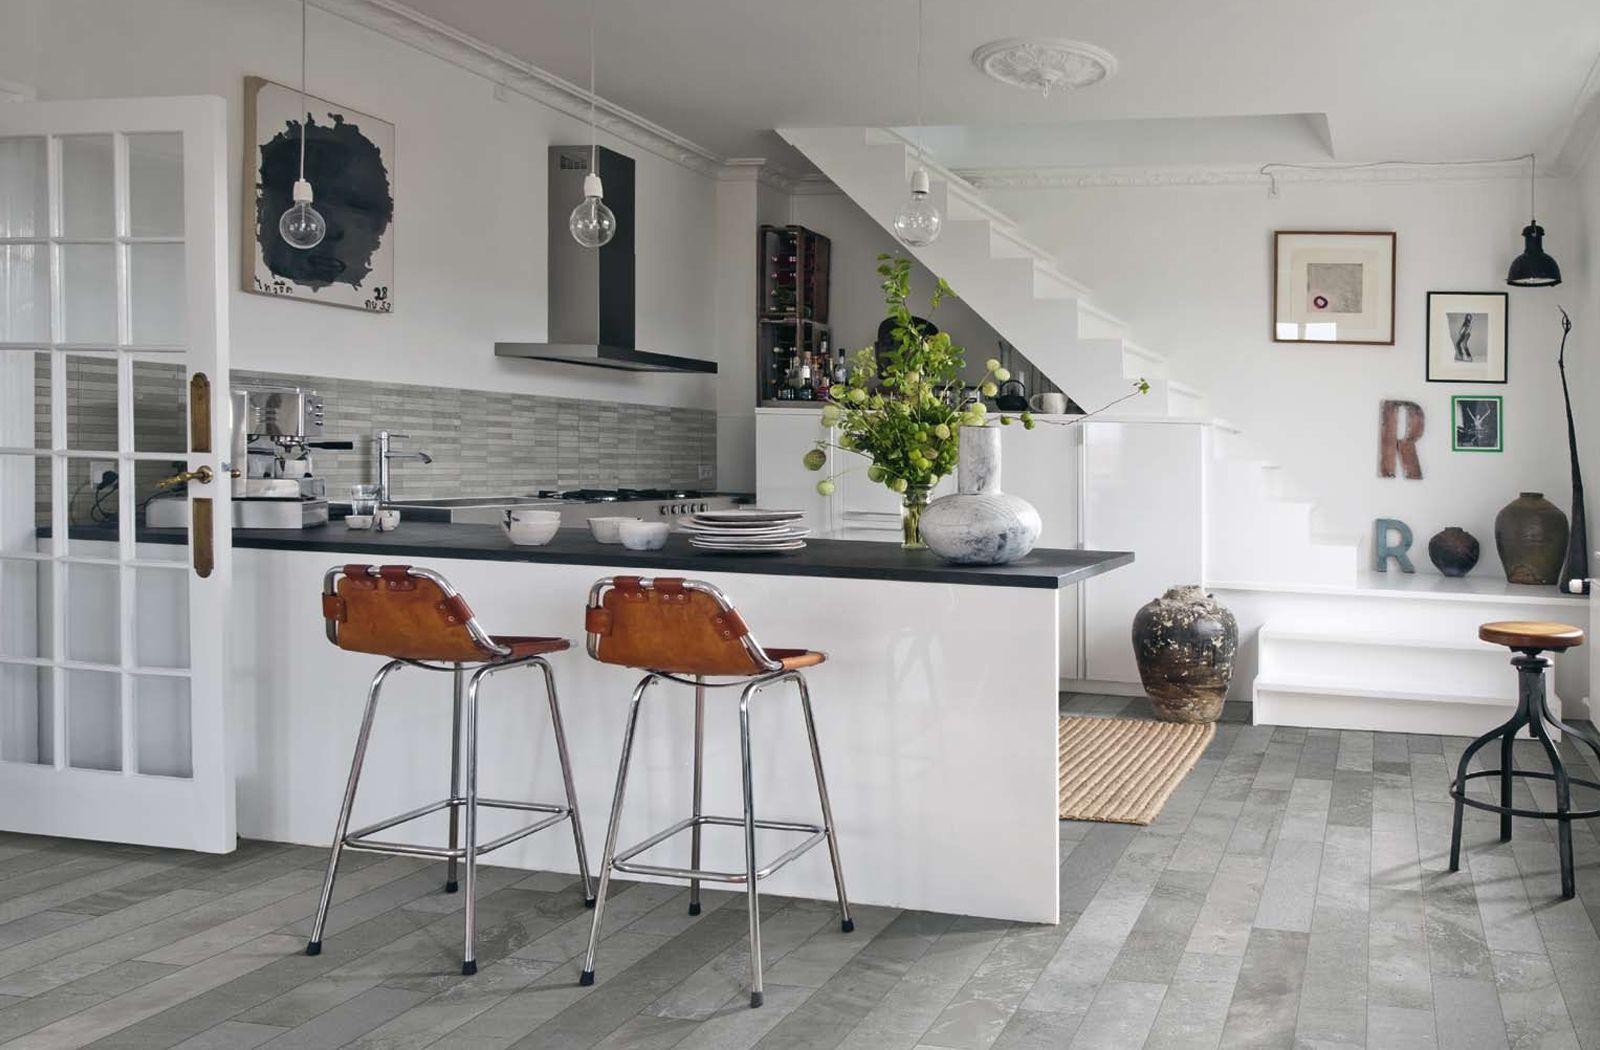 Open Concept Grey And White Kitchen Idea With Burlington Tile From 41zero42 Grey Kitchen Floor Grey Kitchen Tiles Kitchen Flooring